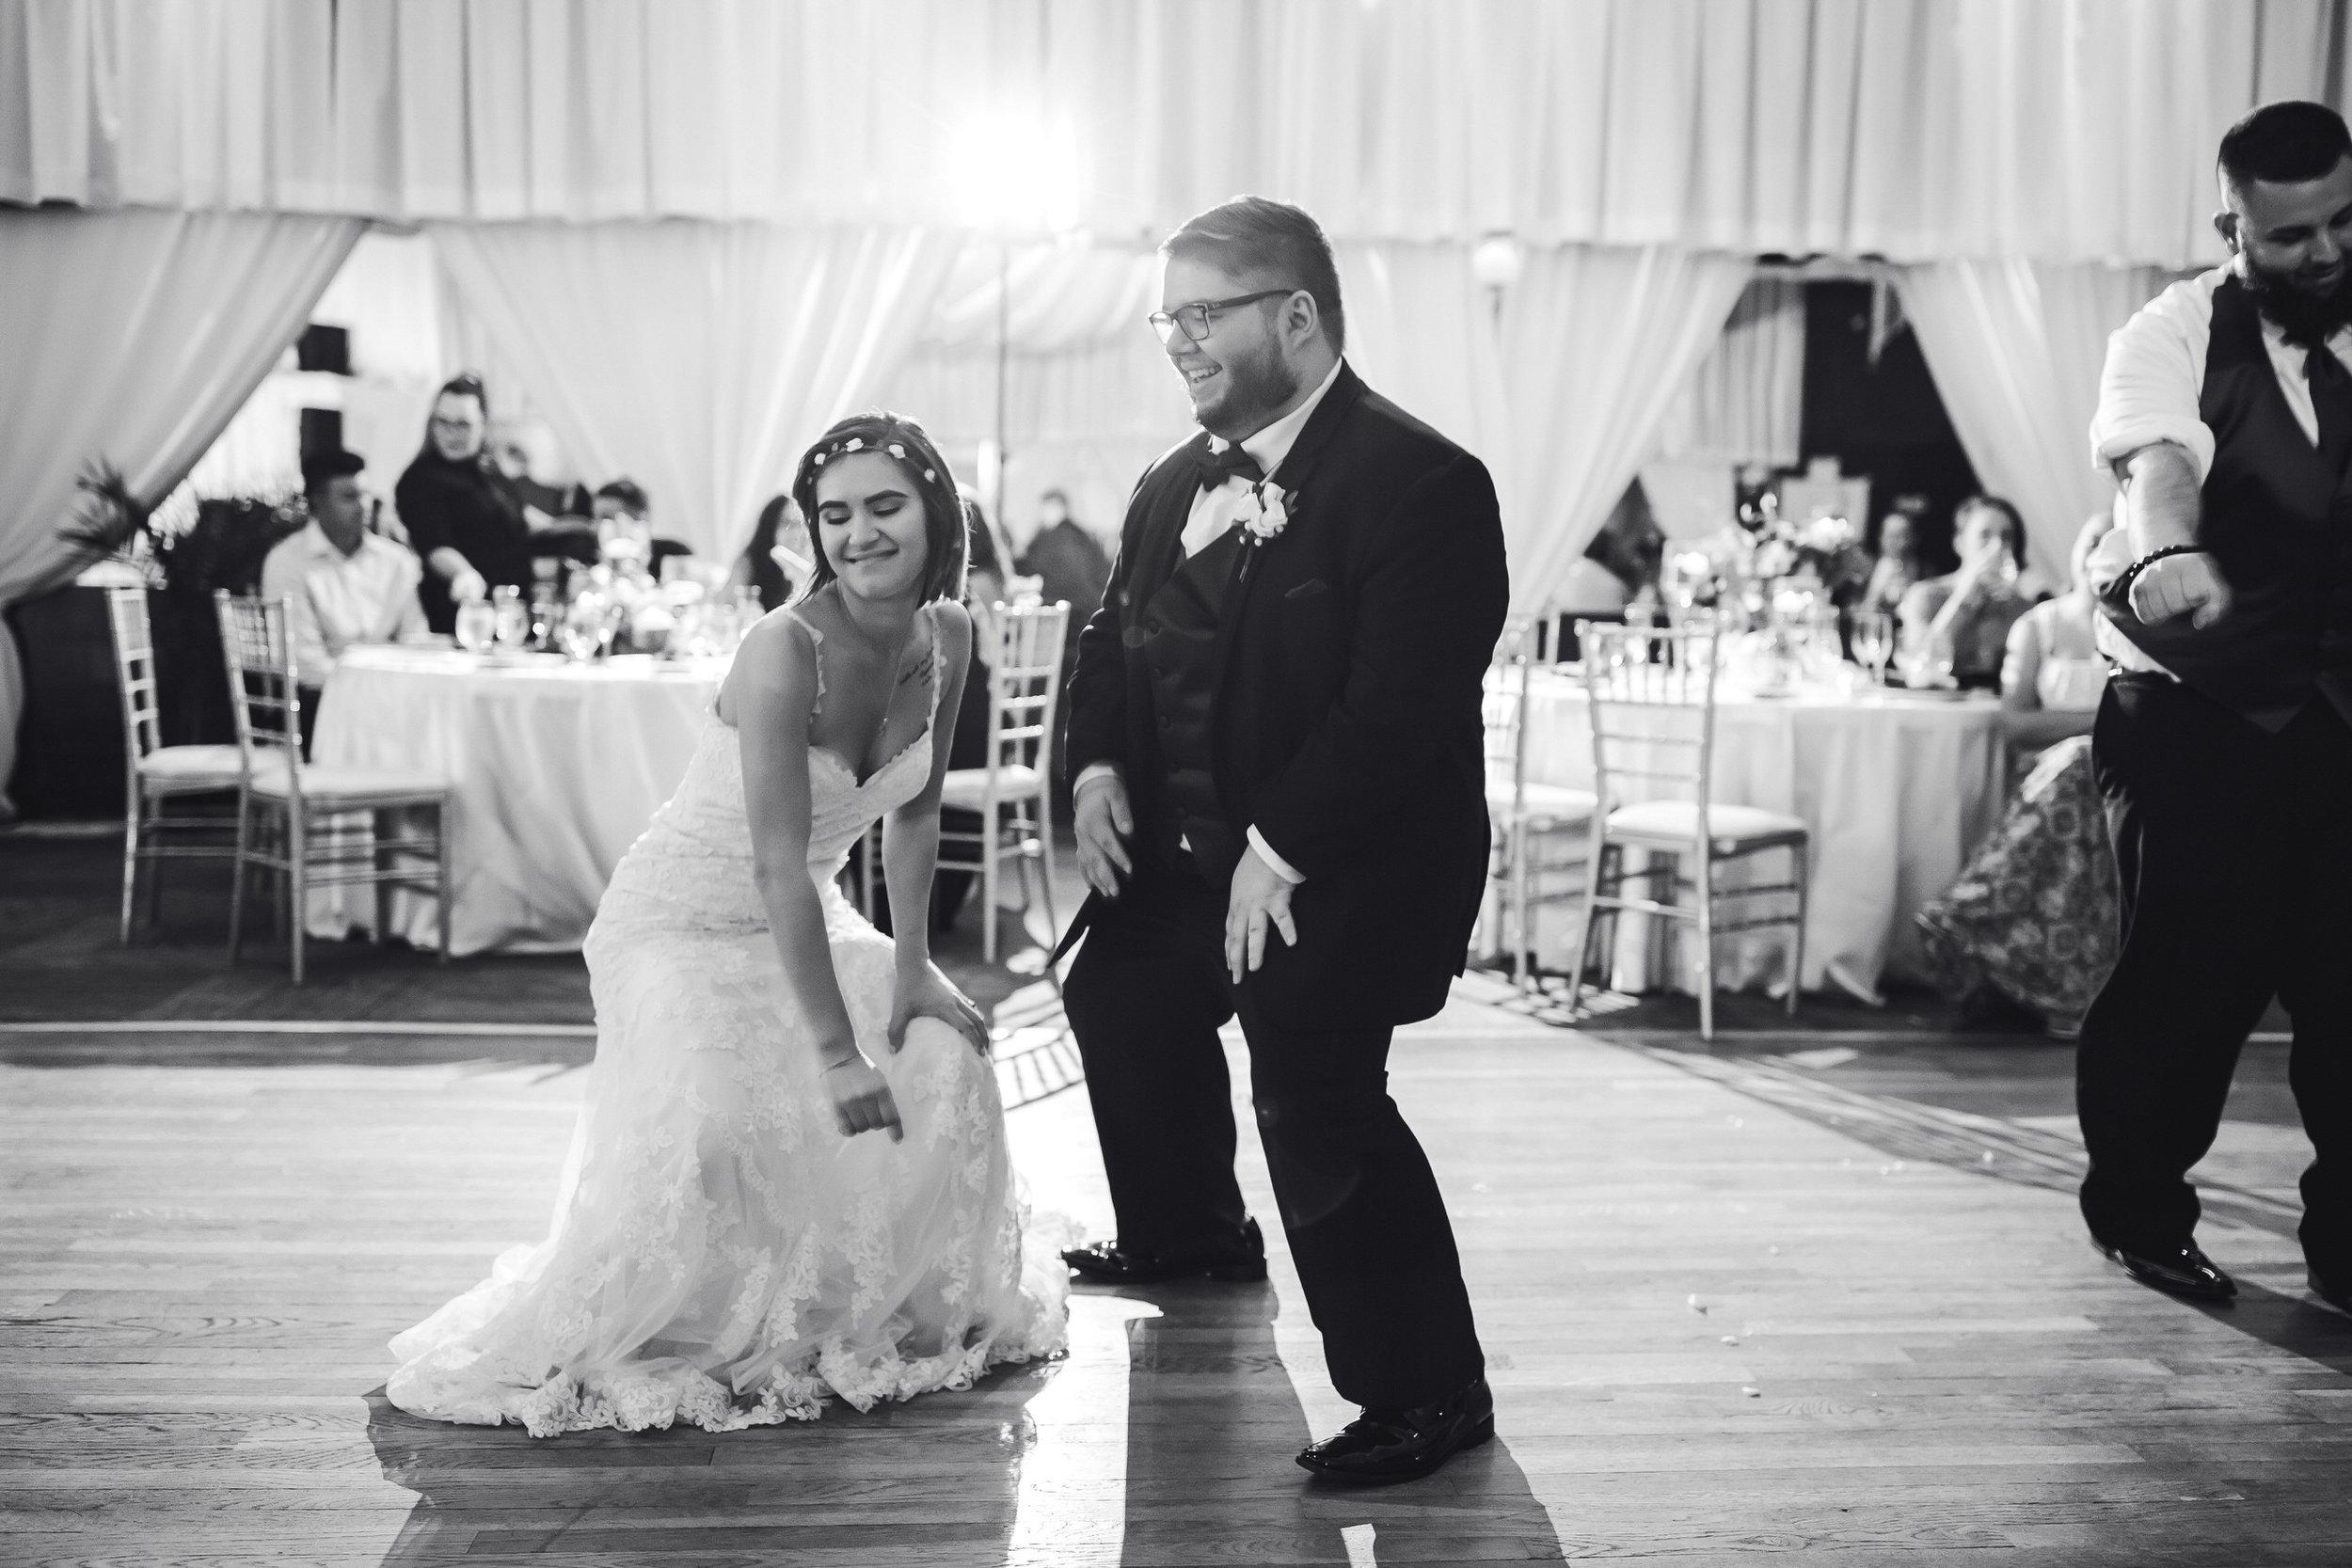 dance_like_no_one_is_watching_tiny_house_photo_weddings.jpg